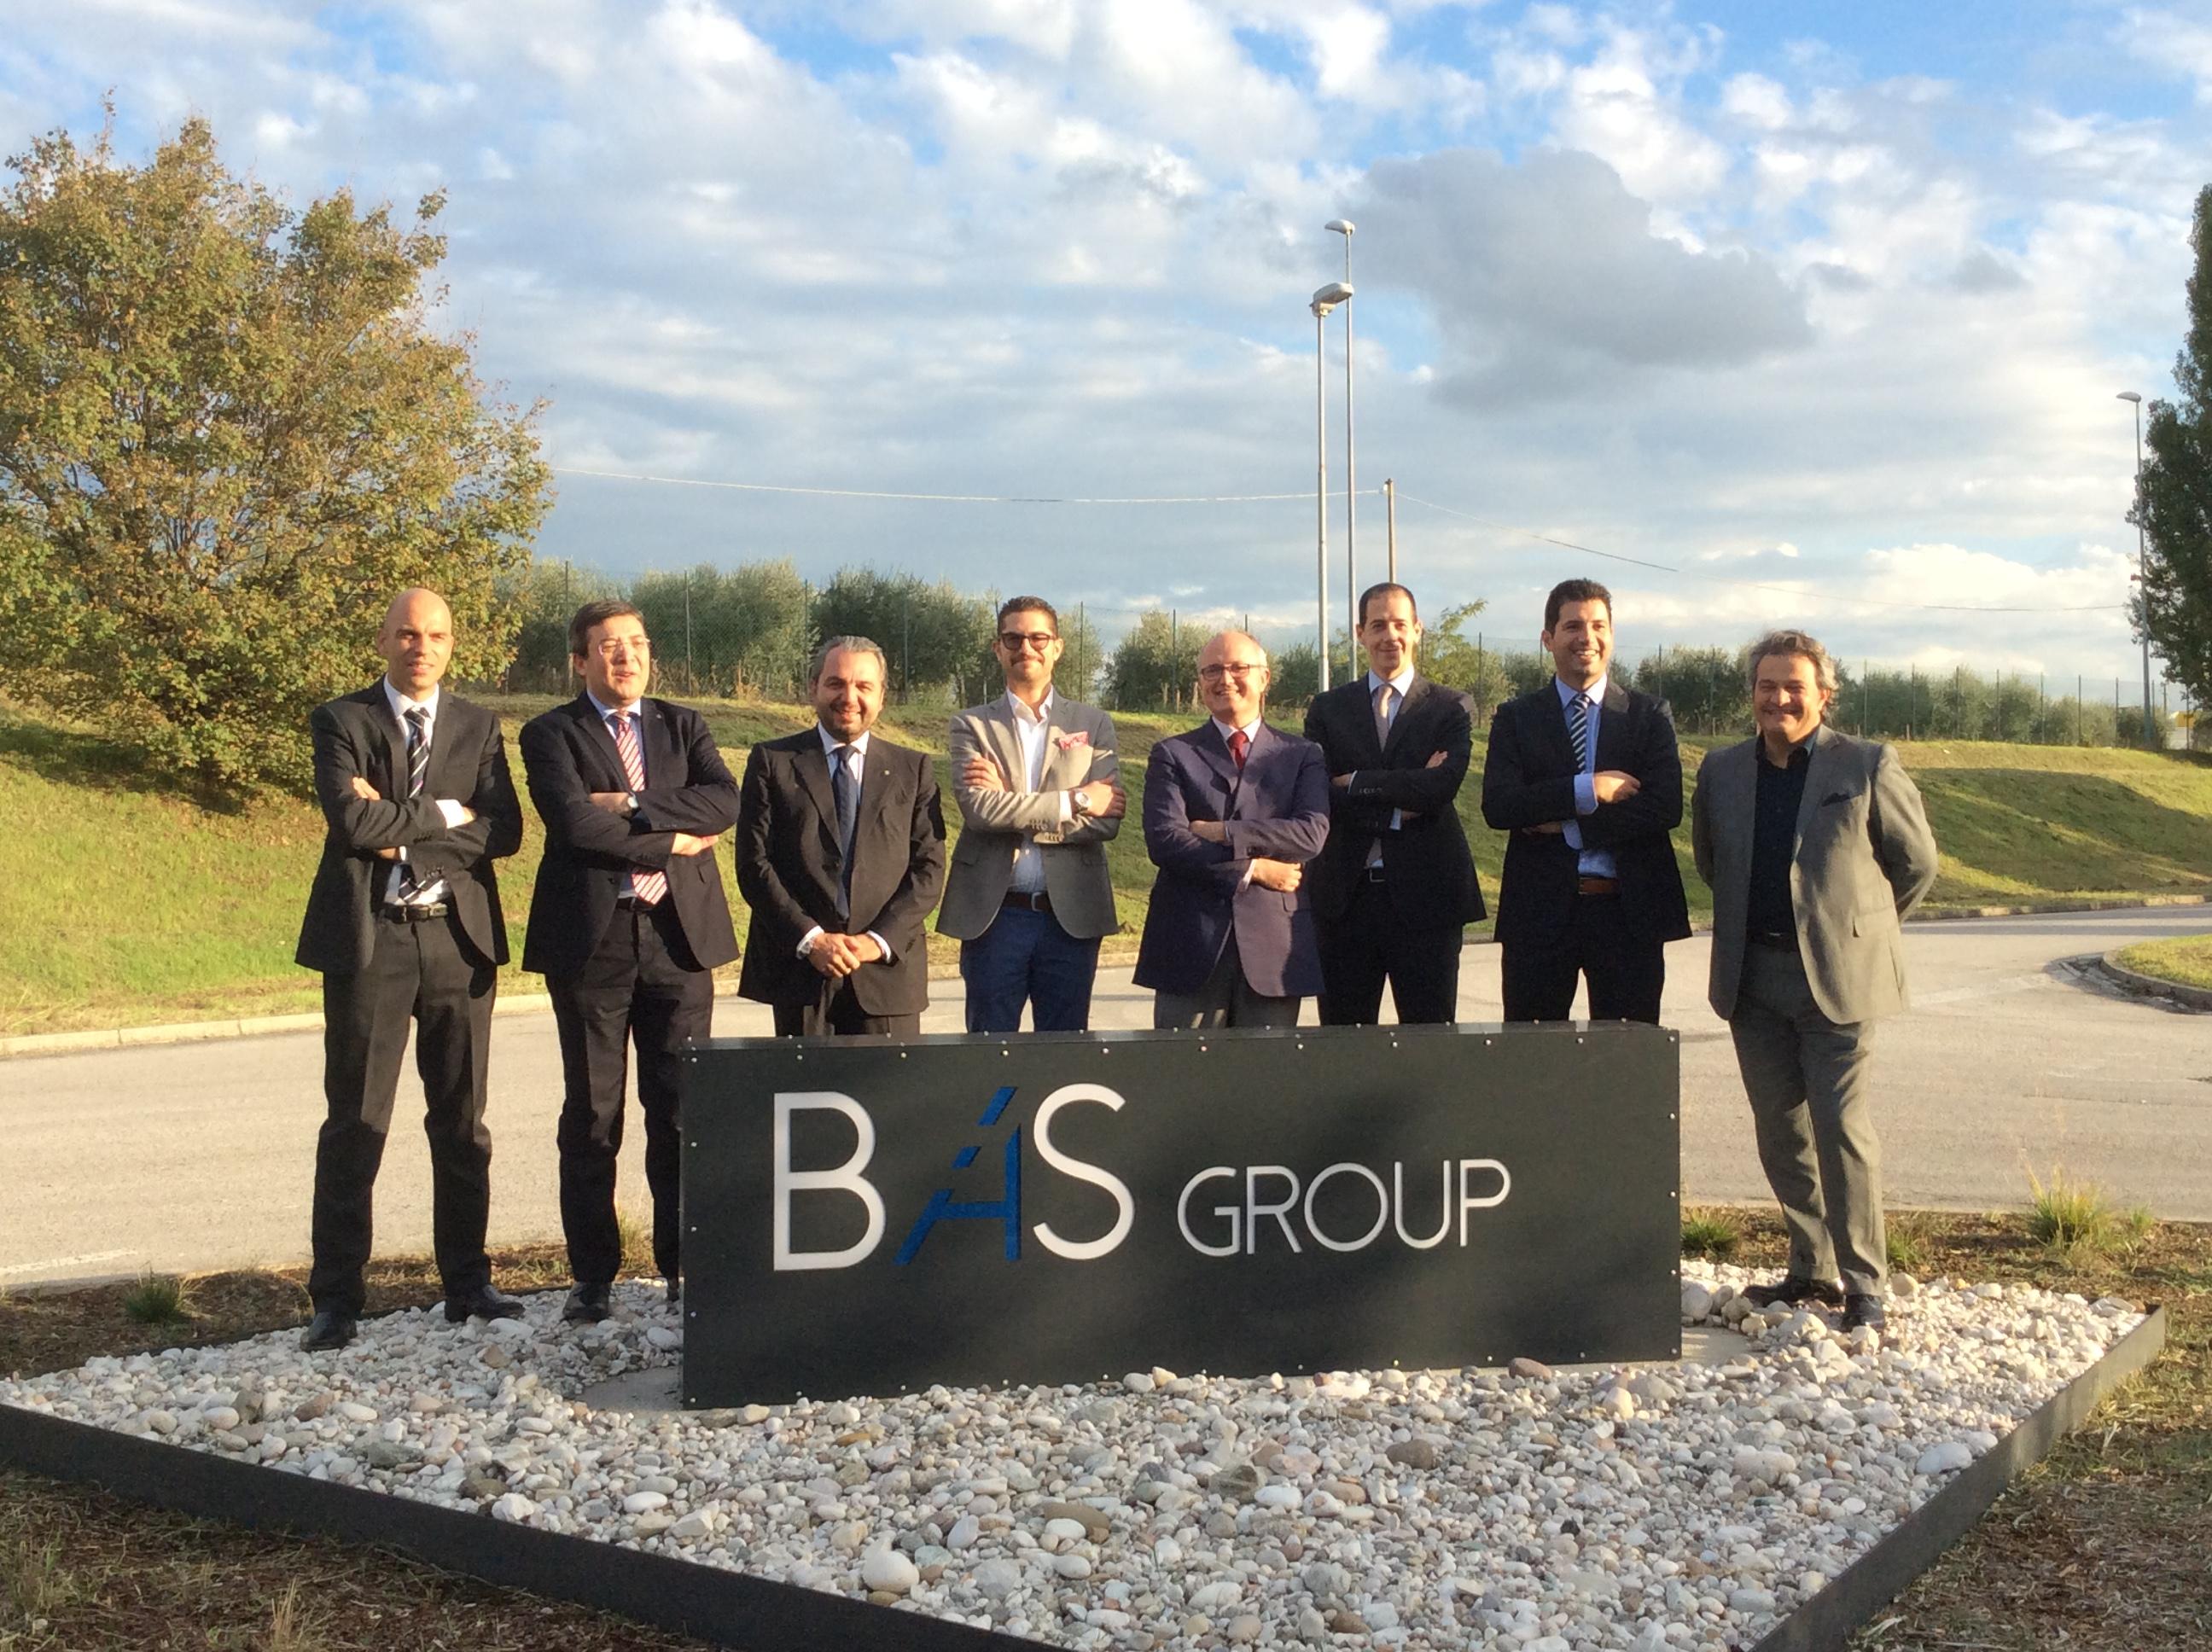 Bas Group